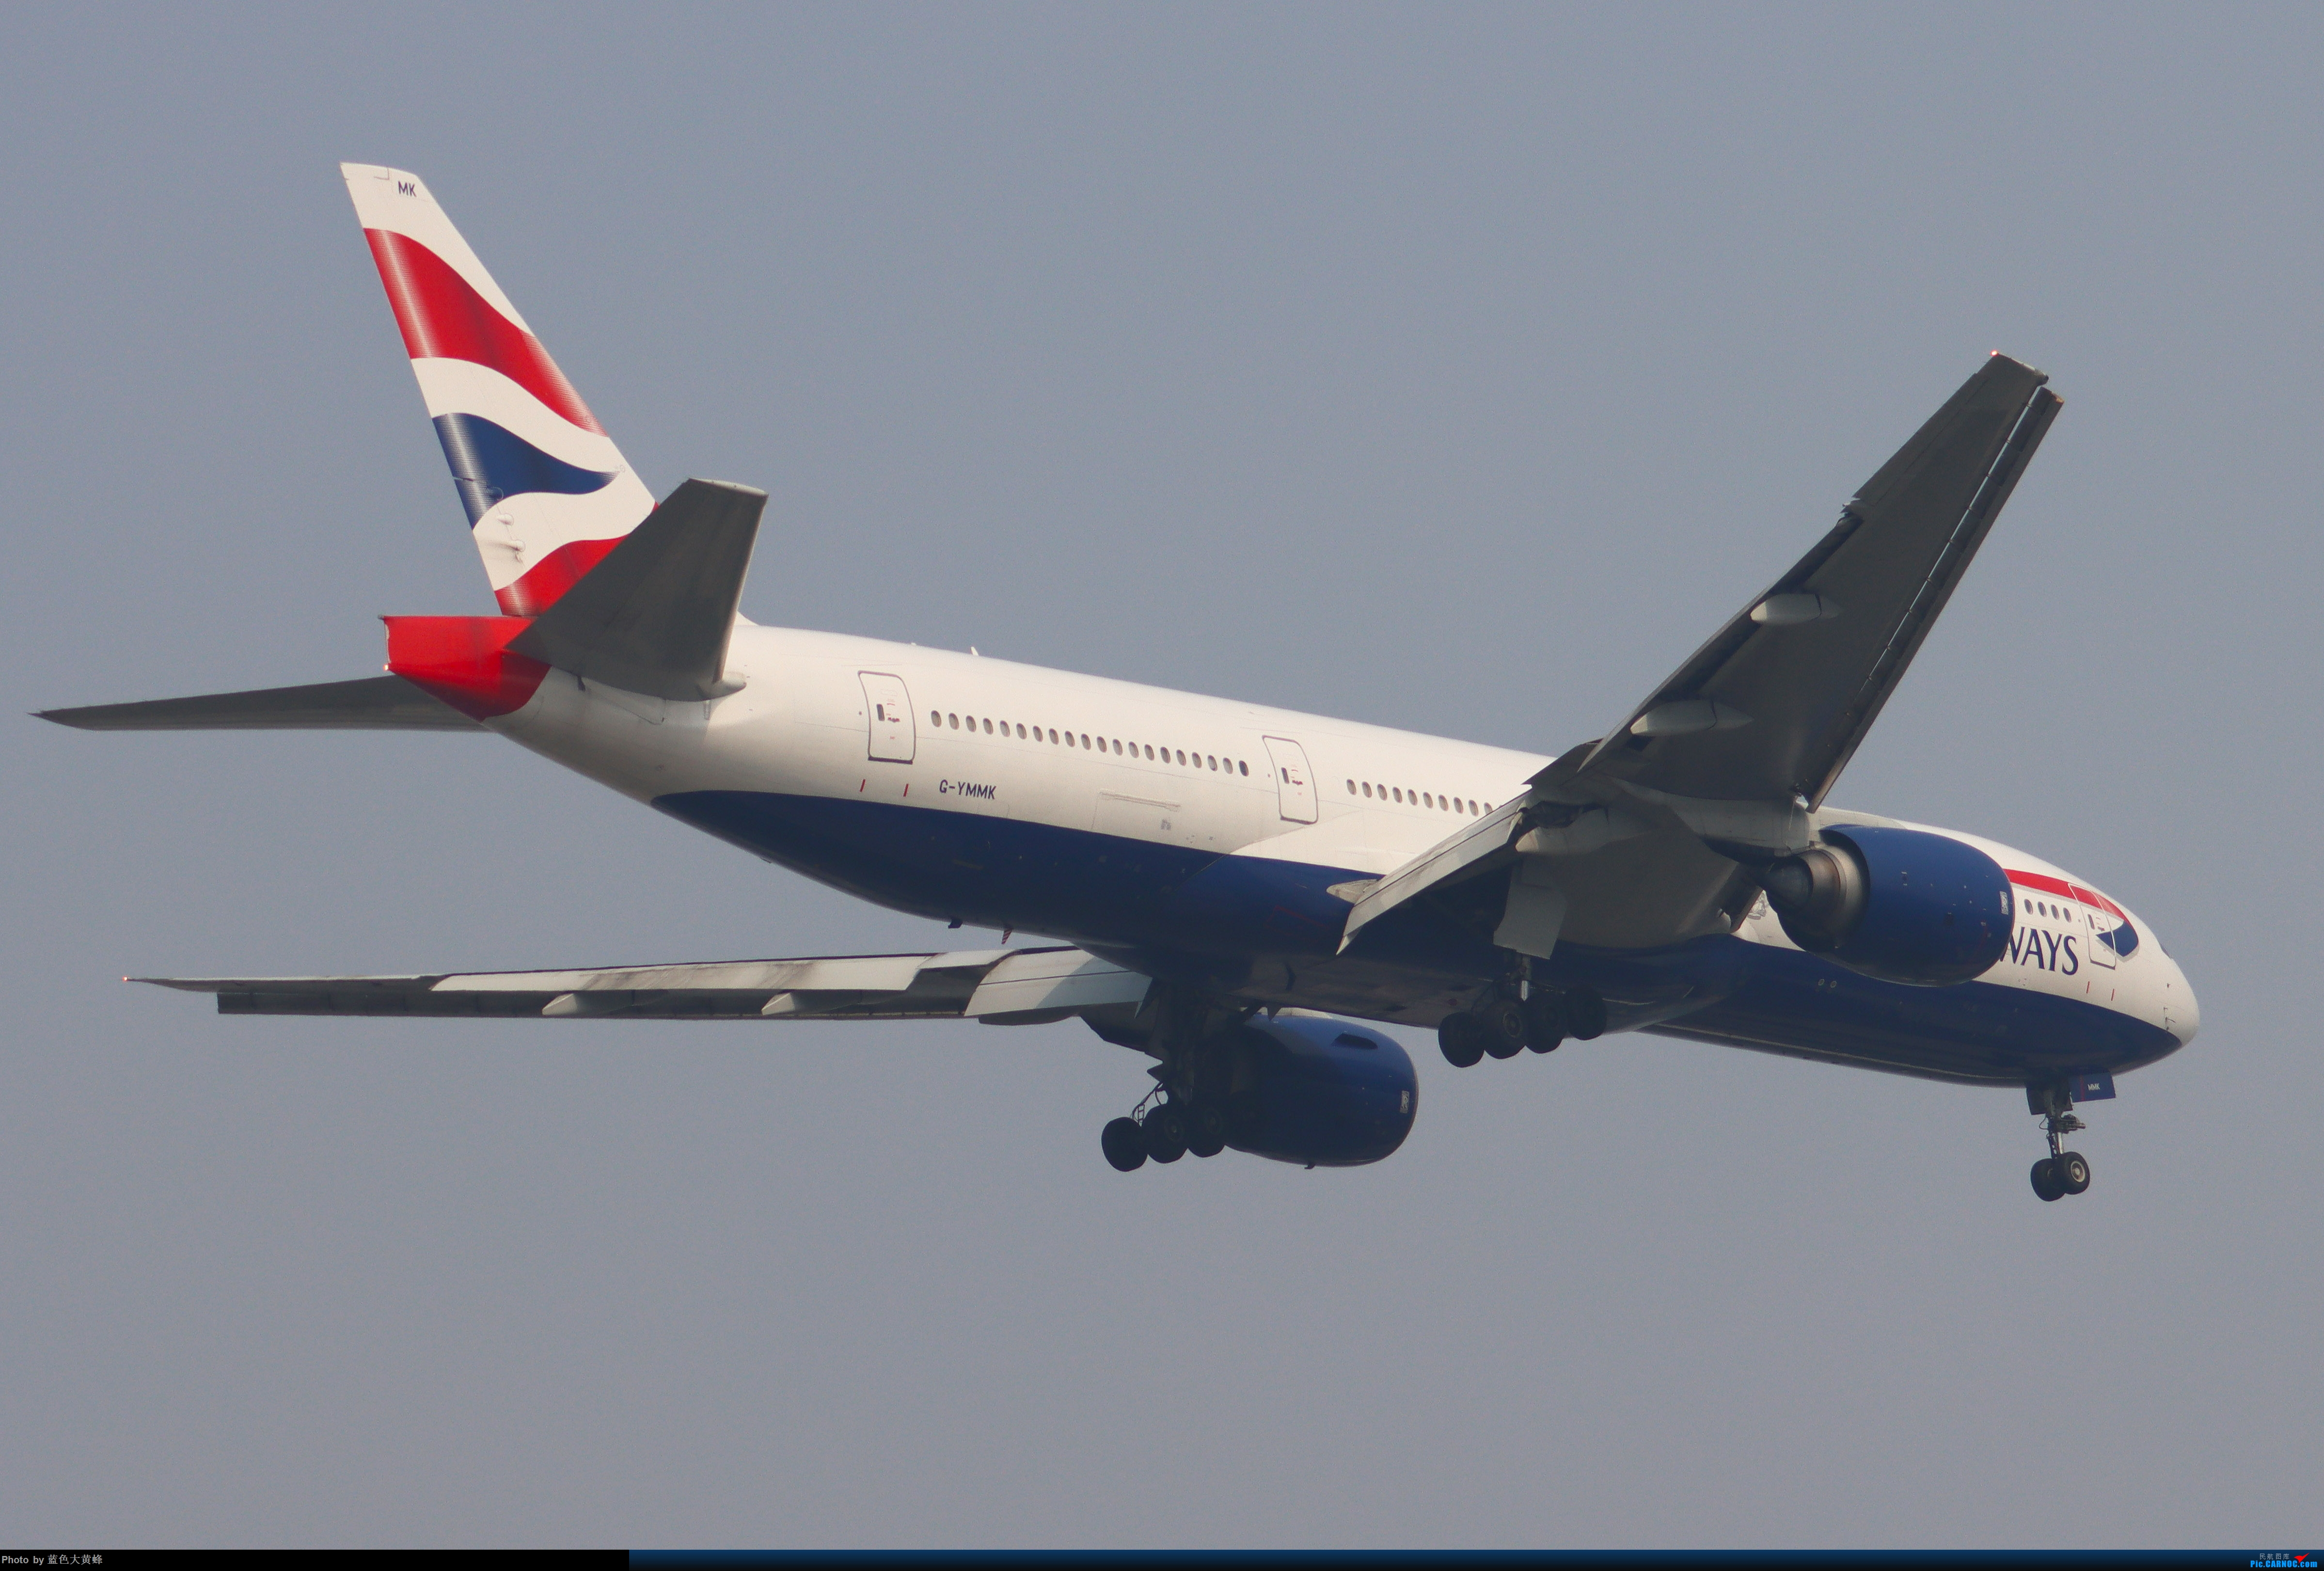 Re:[原创]2020.5.30PEK拍机,偶遇联邦的MD11给18R降落,实属罕见 BOEING 777-200ER G-YMMK 中国北京首都国际机场